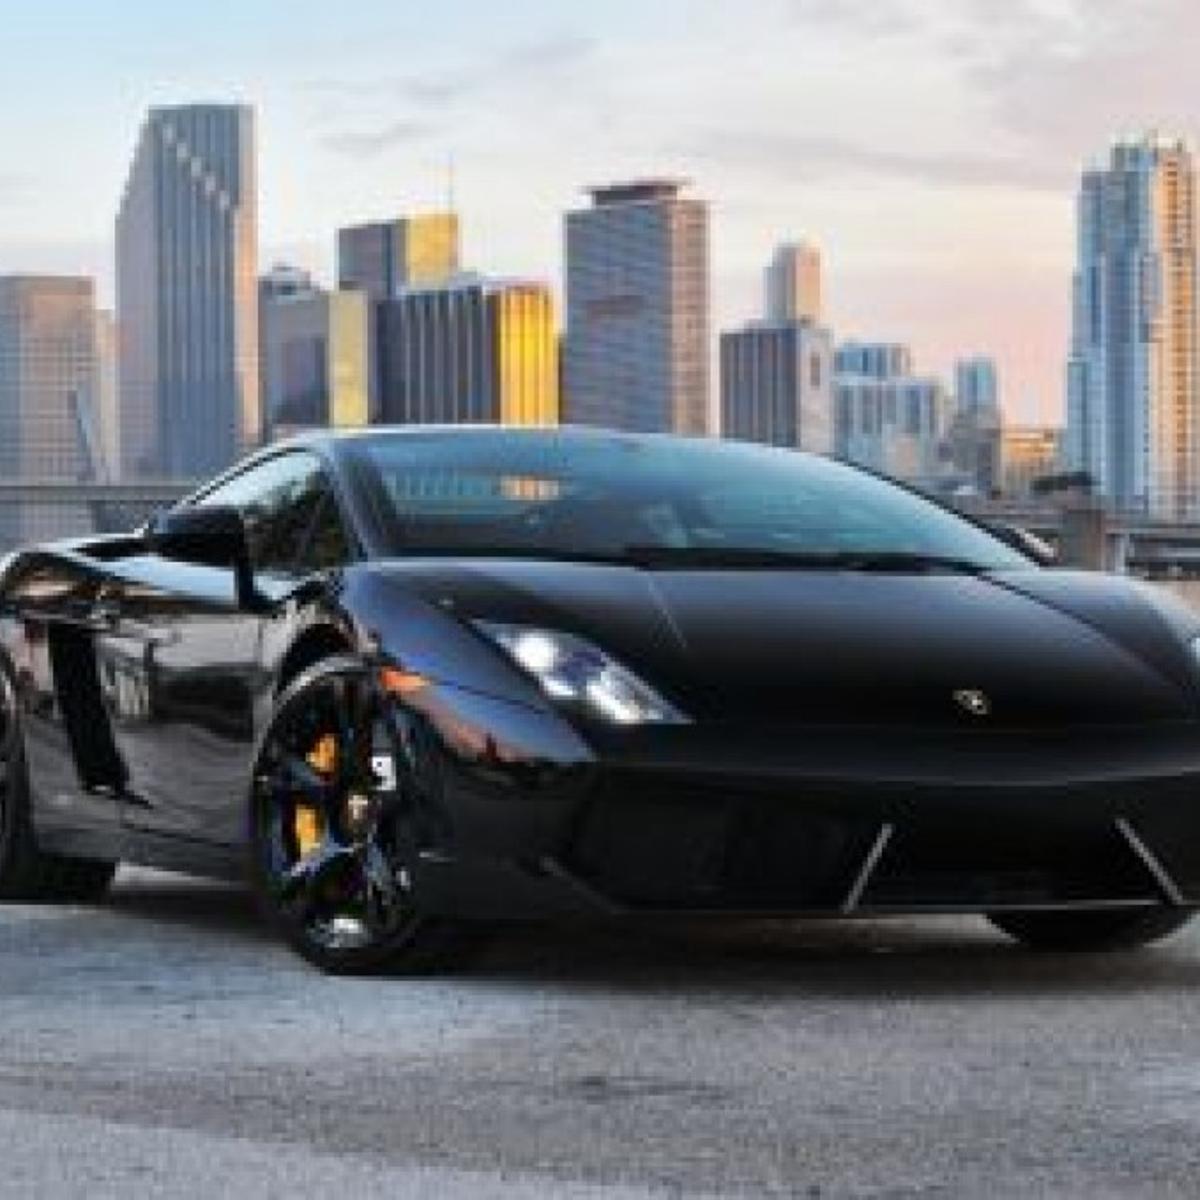 Hertz Offering New Luxury Car Rentals In St Louis Local Business Stltoday Com